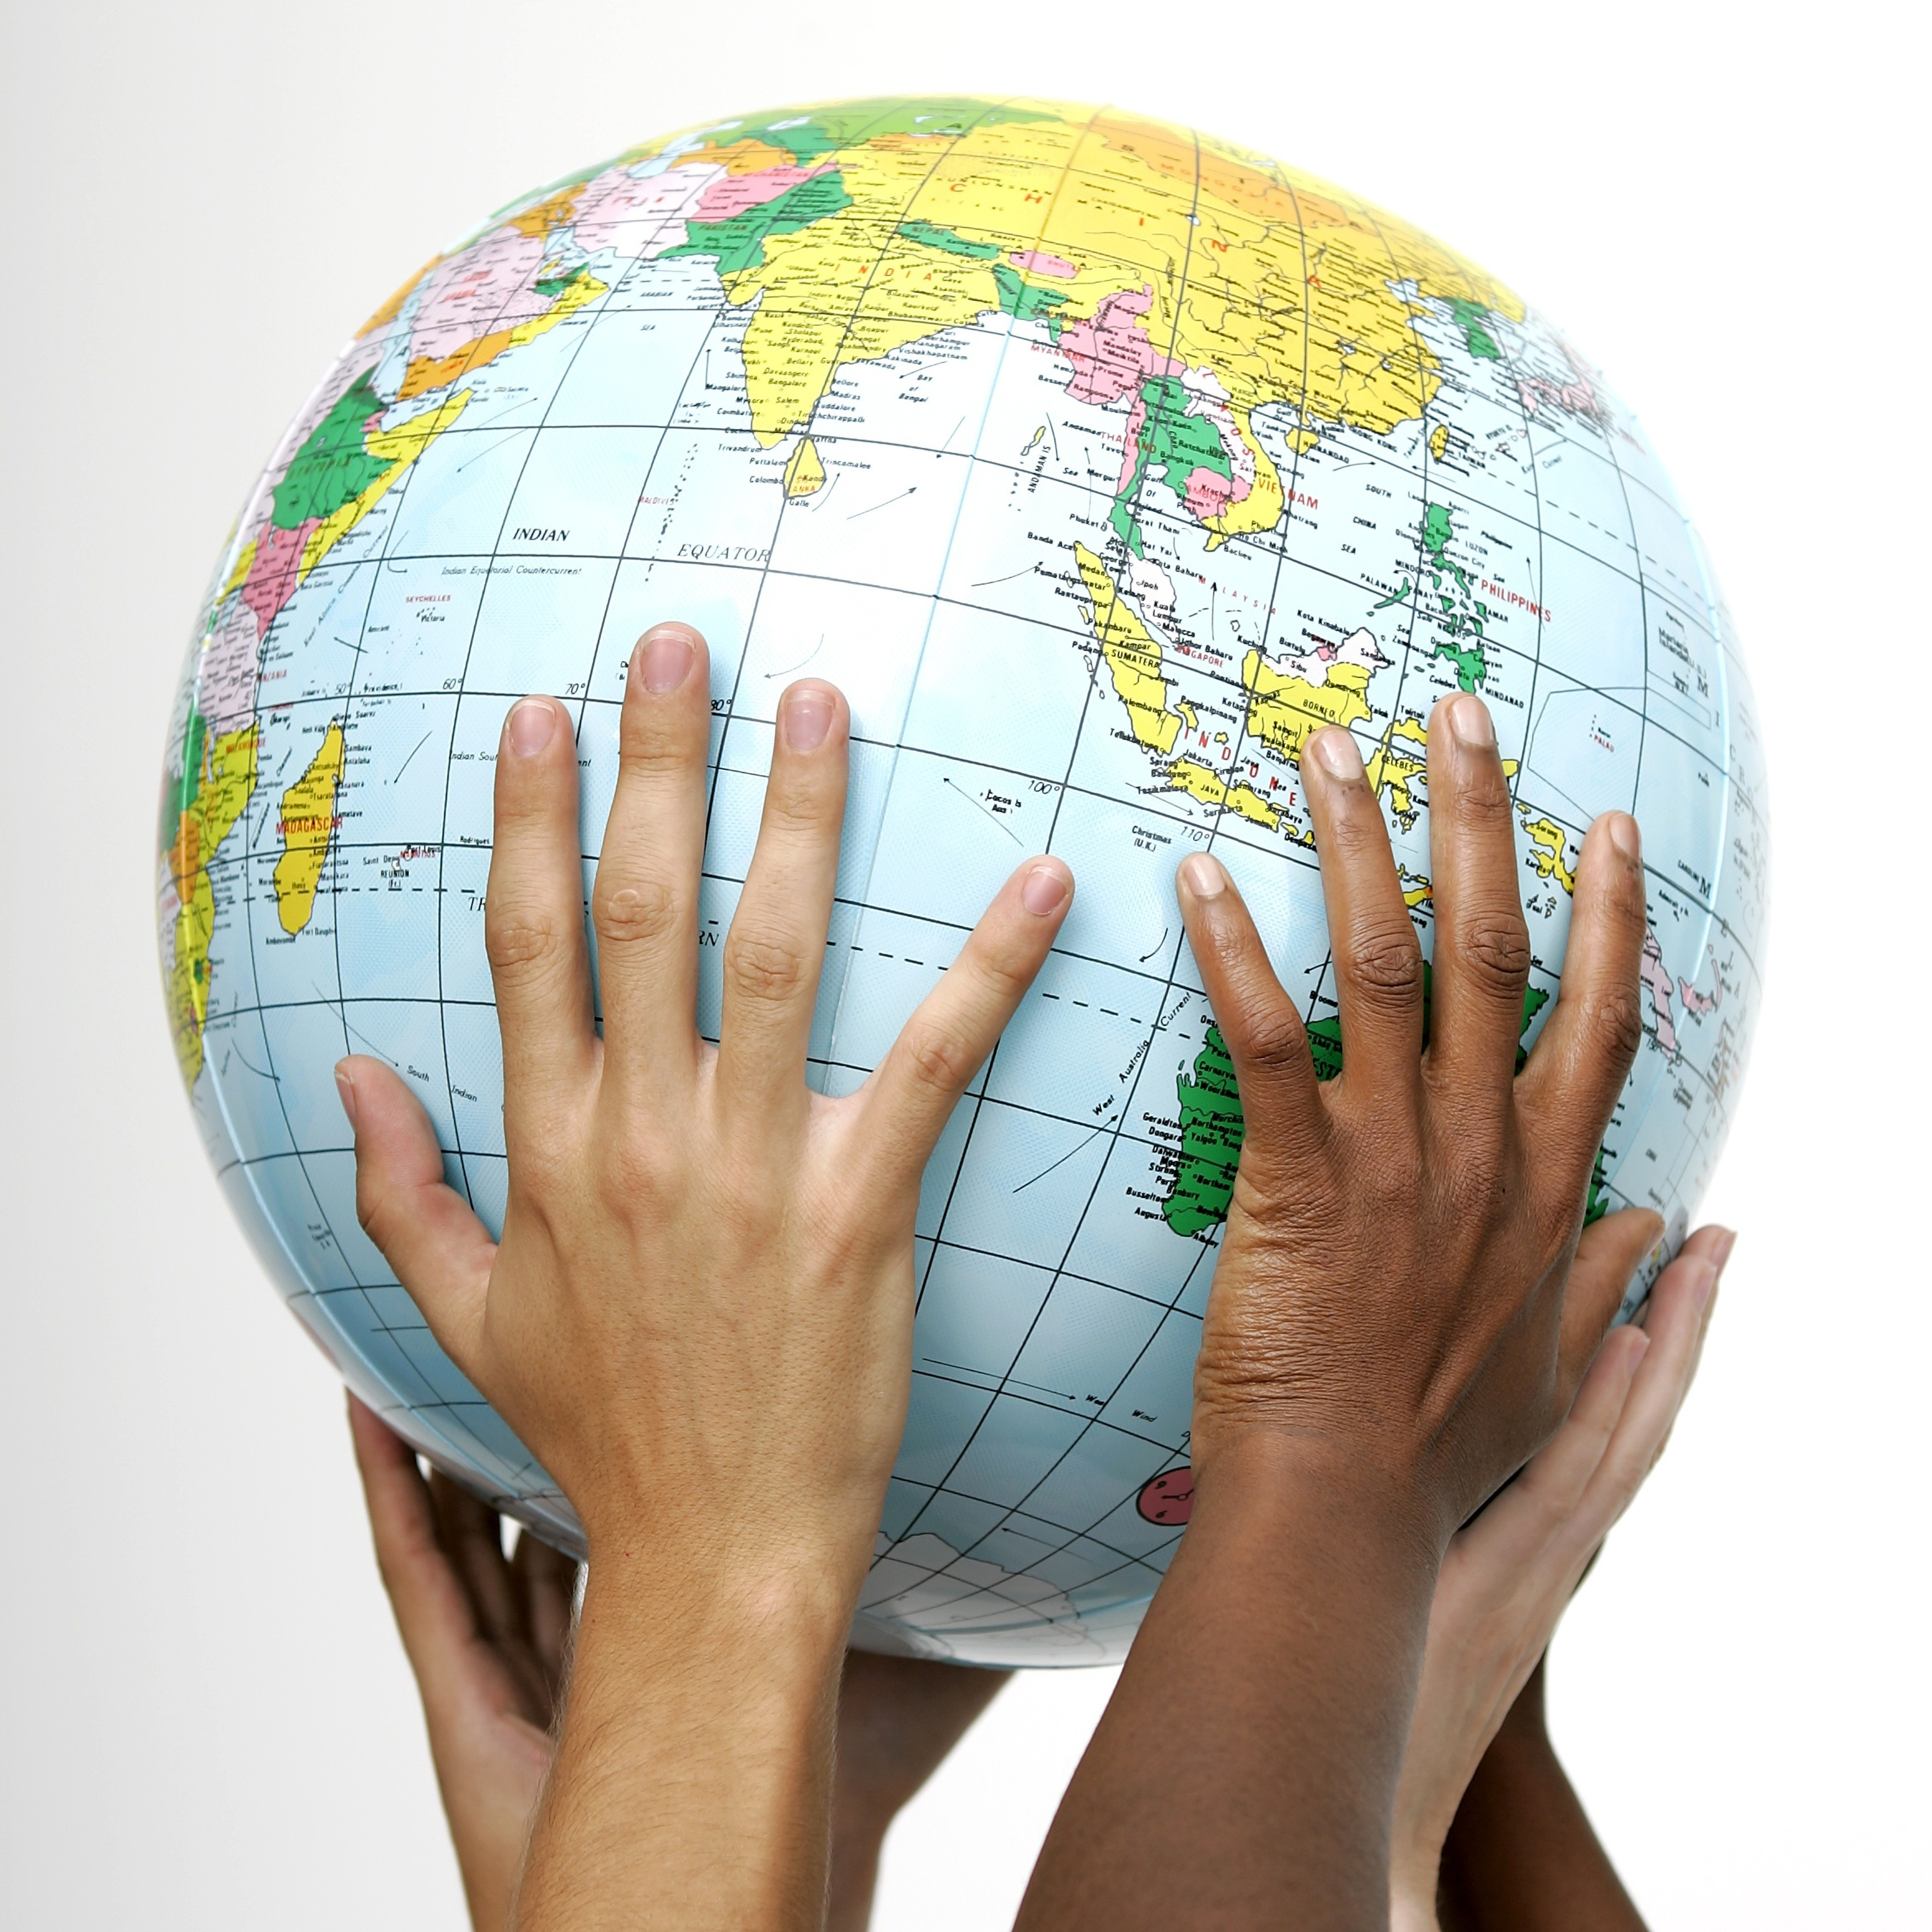 Five different children's hands raising up a globe